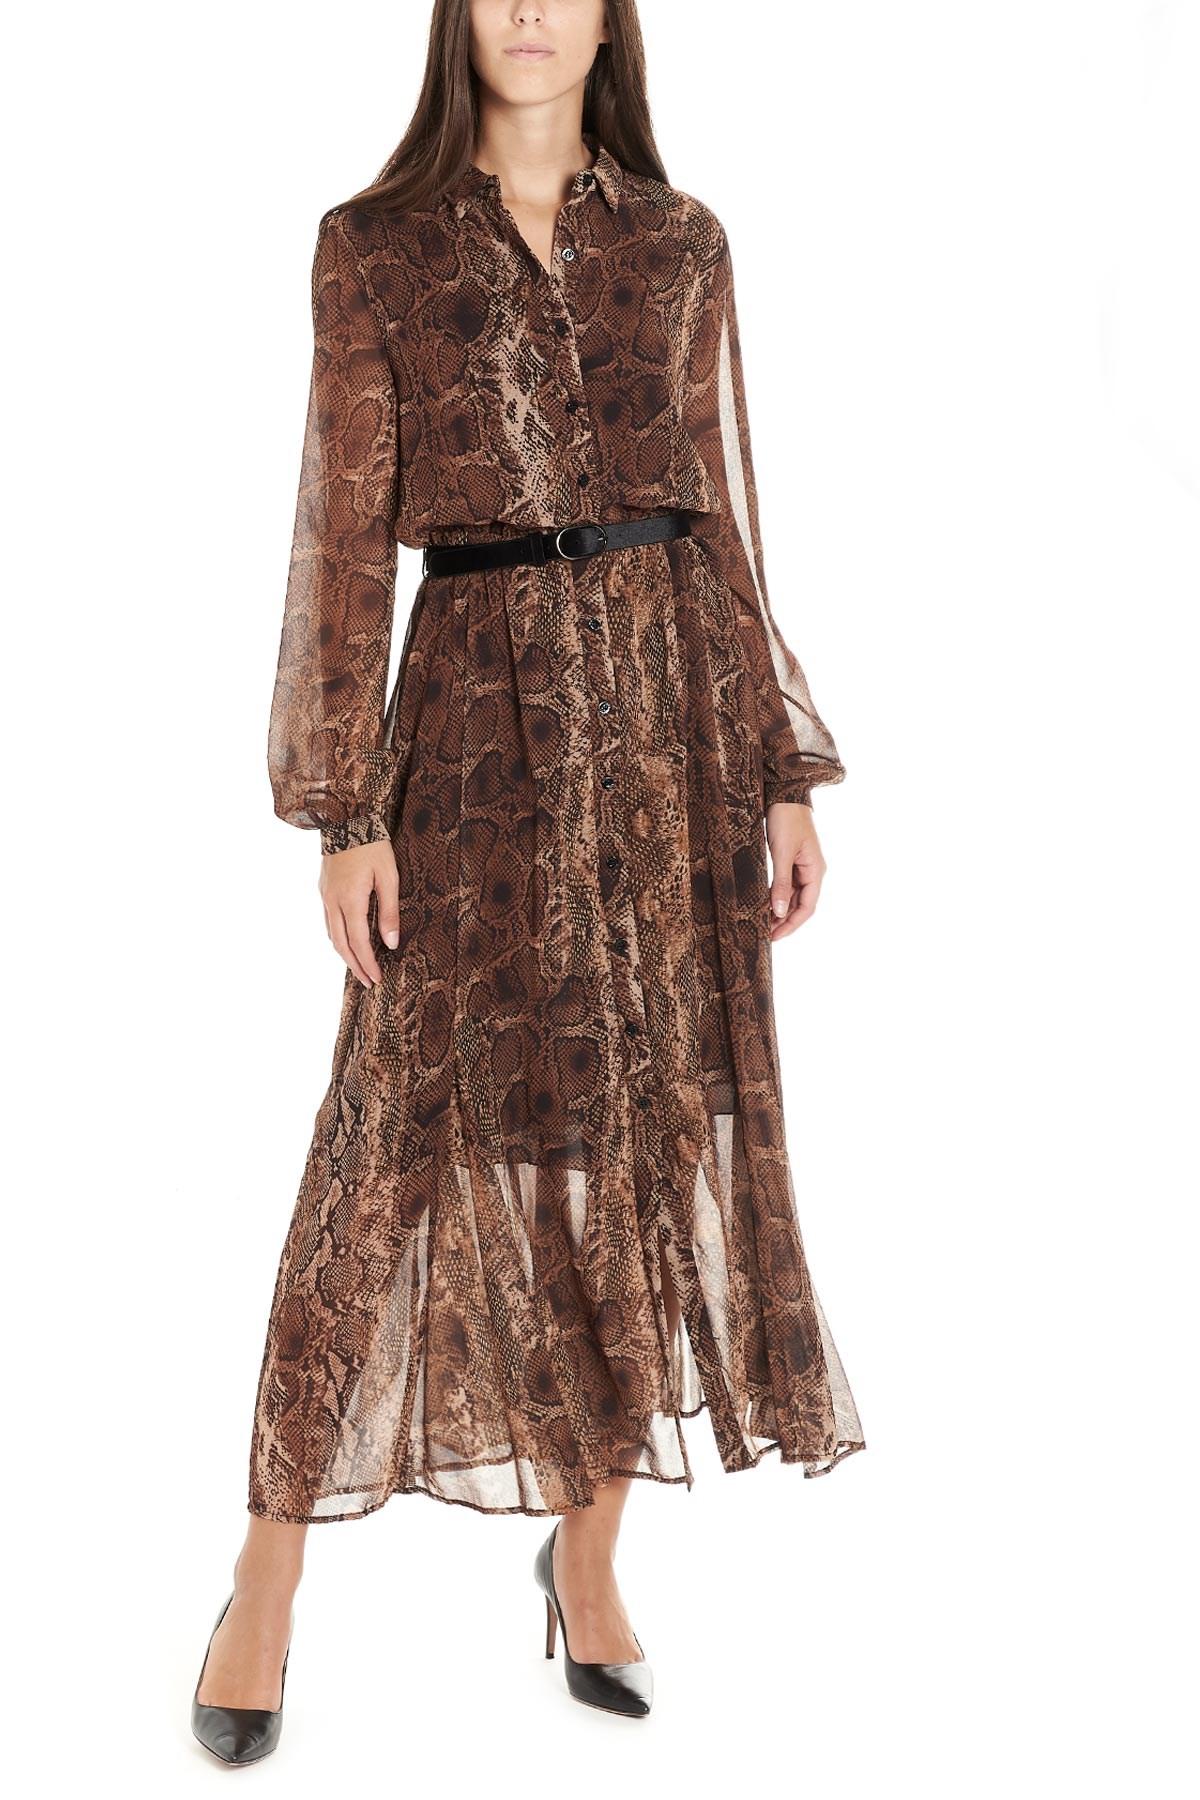 new product ce6ed b9765 liu jo Animalier dress available on www.julian-fashion.com ...